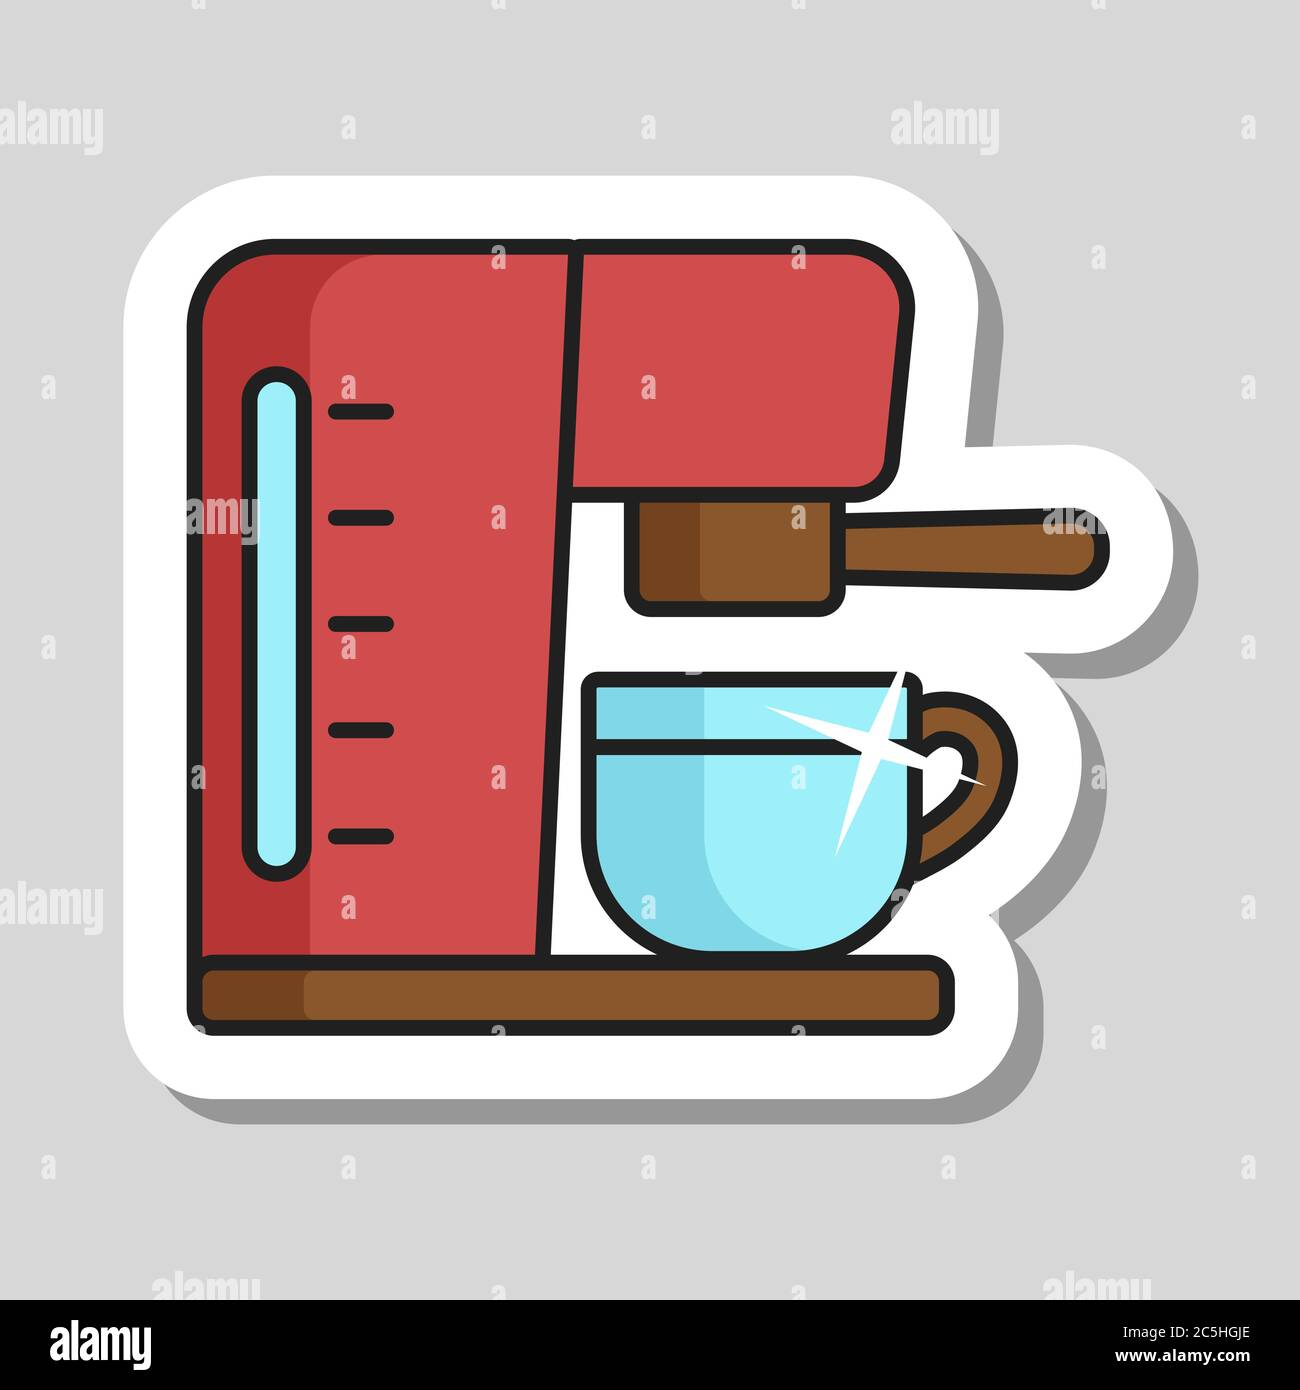 Cafetera con icono de vector de taza para casa, restaurante